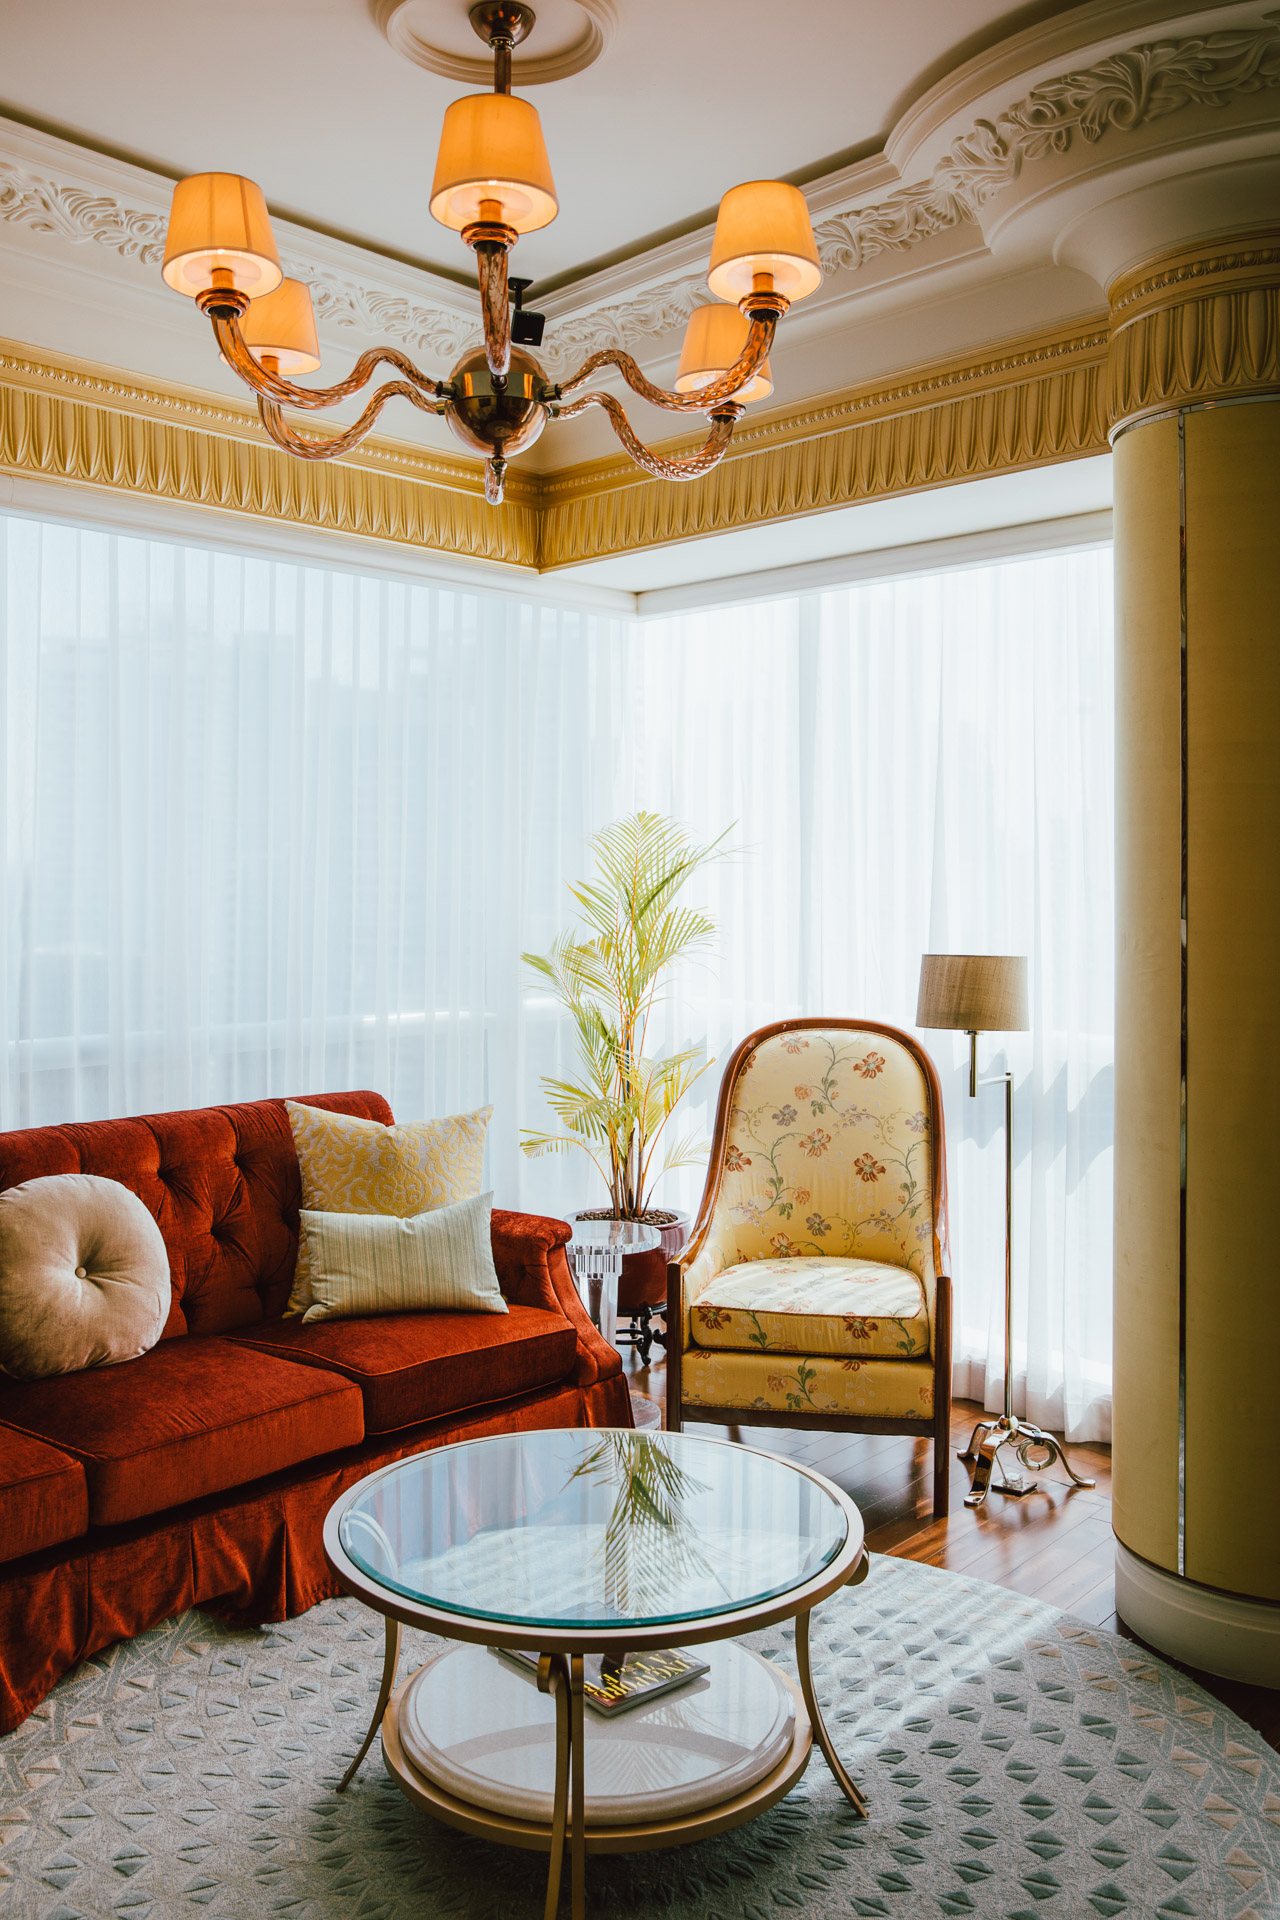 st-regis-singapore-marriott-luxury-hotel-photographer-16.jpg